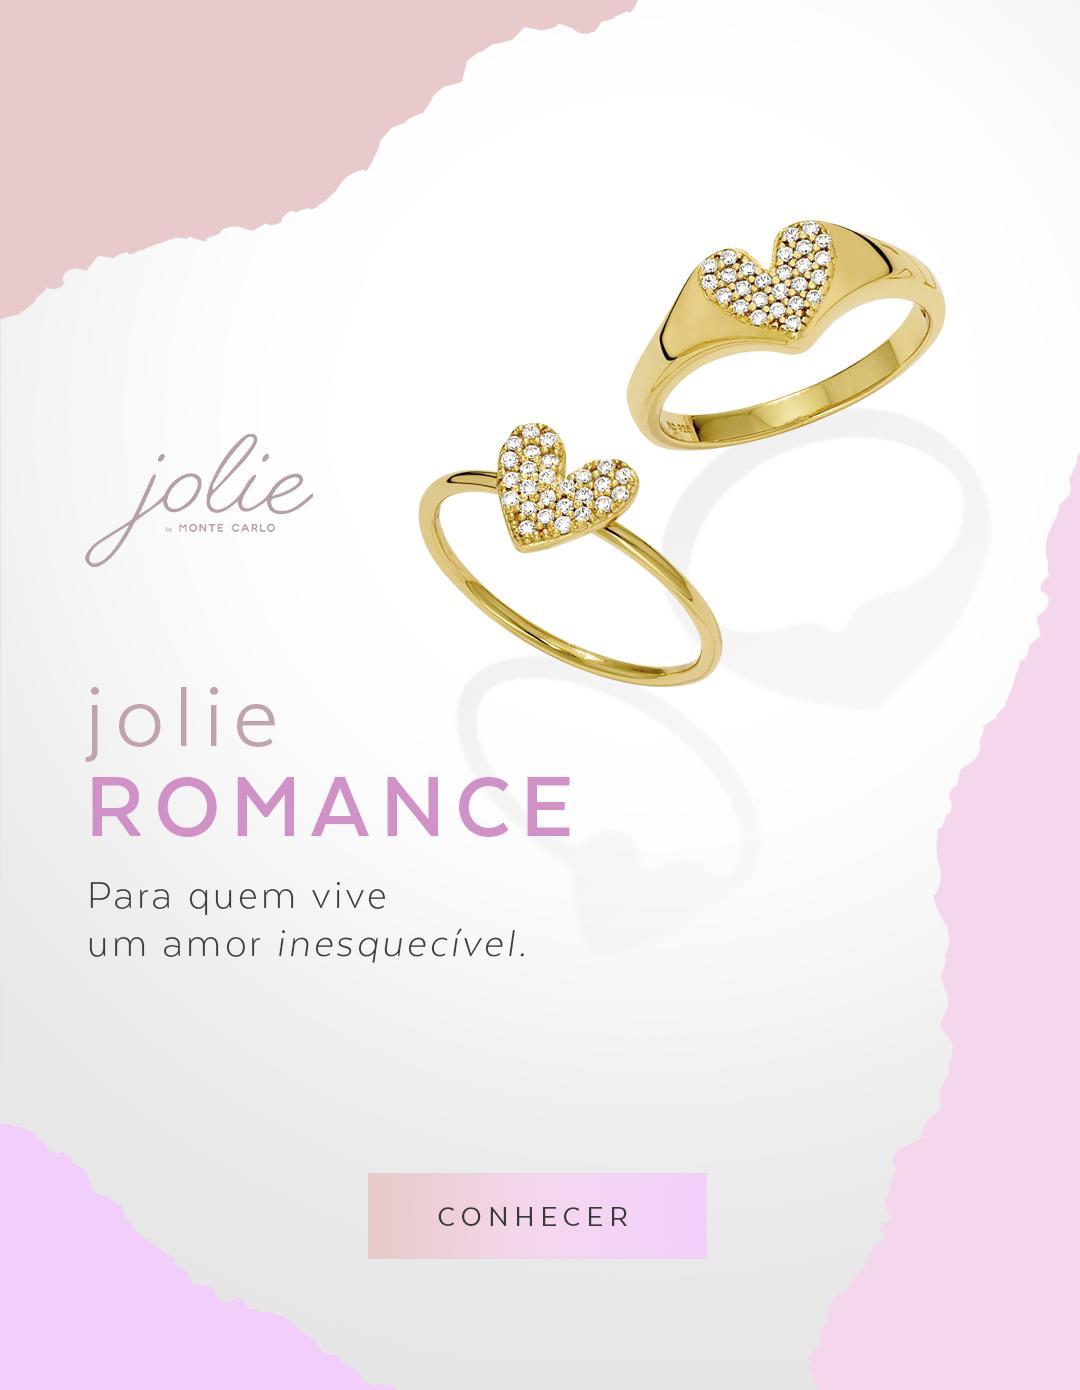 Jolie Romance